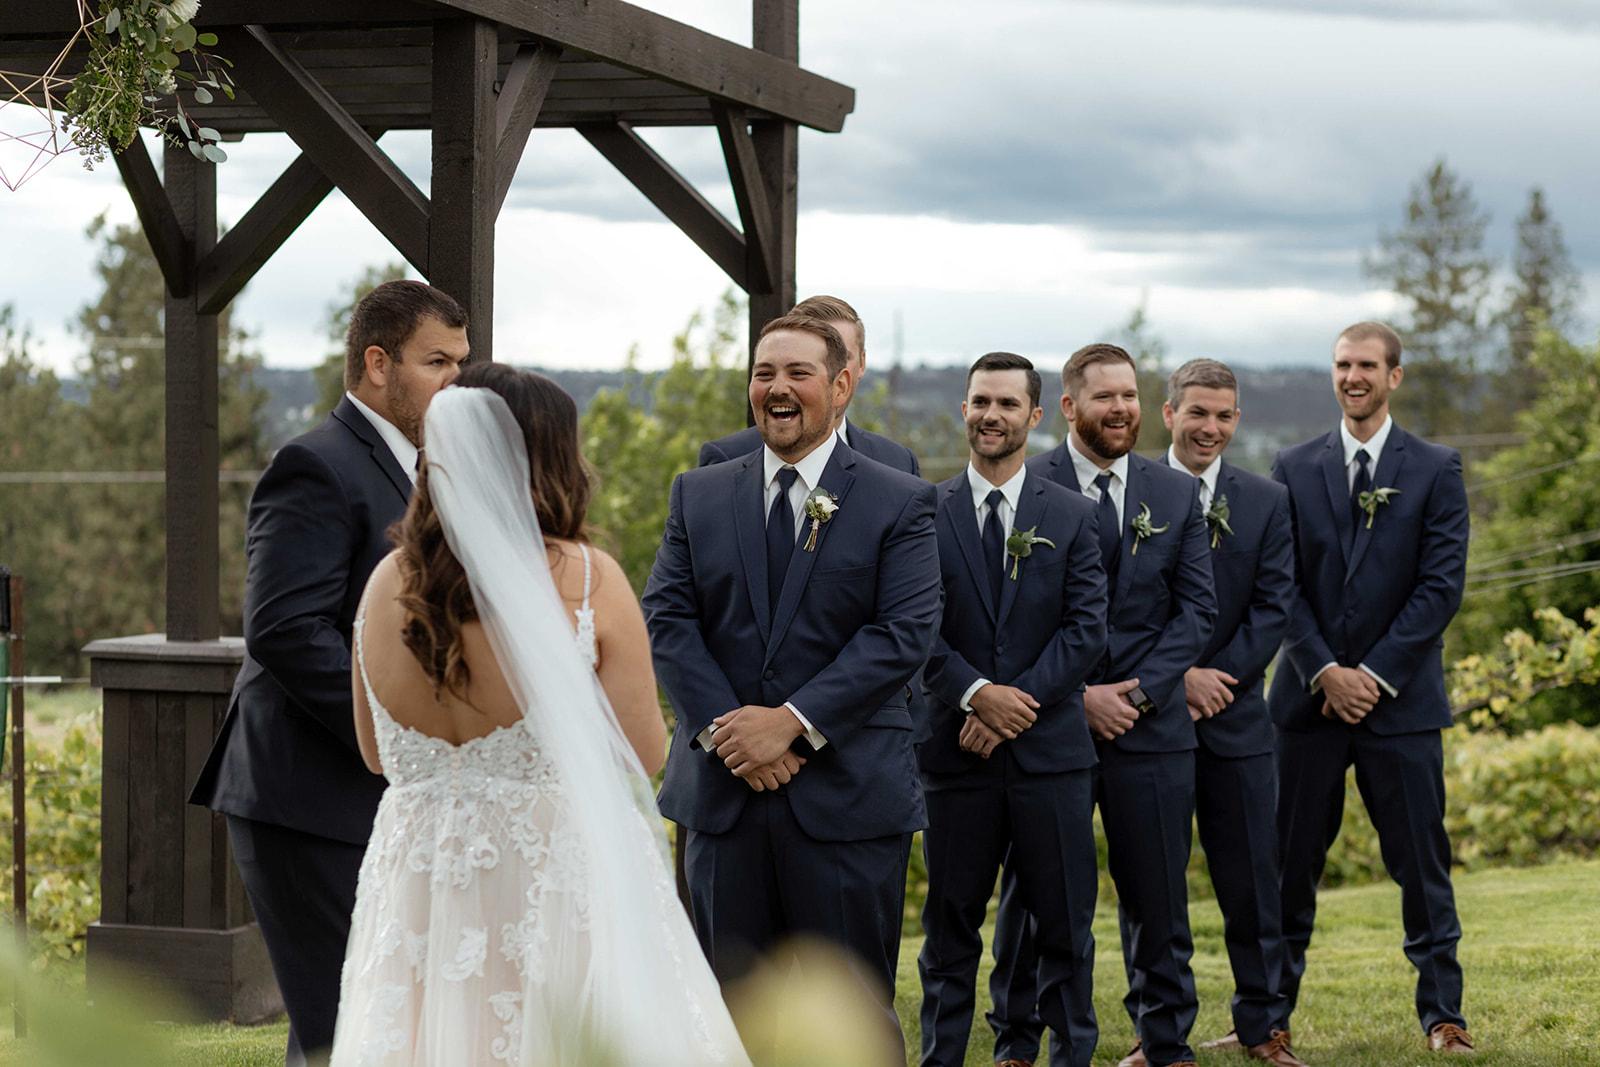 beacon hill wedding honest in ivory dress spokane vows